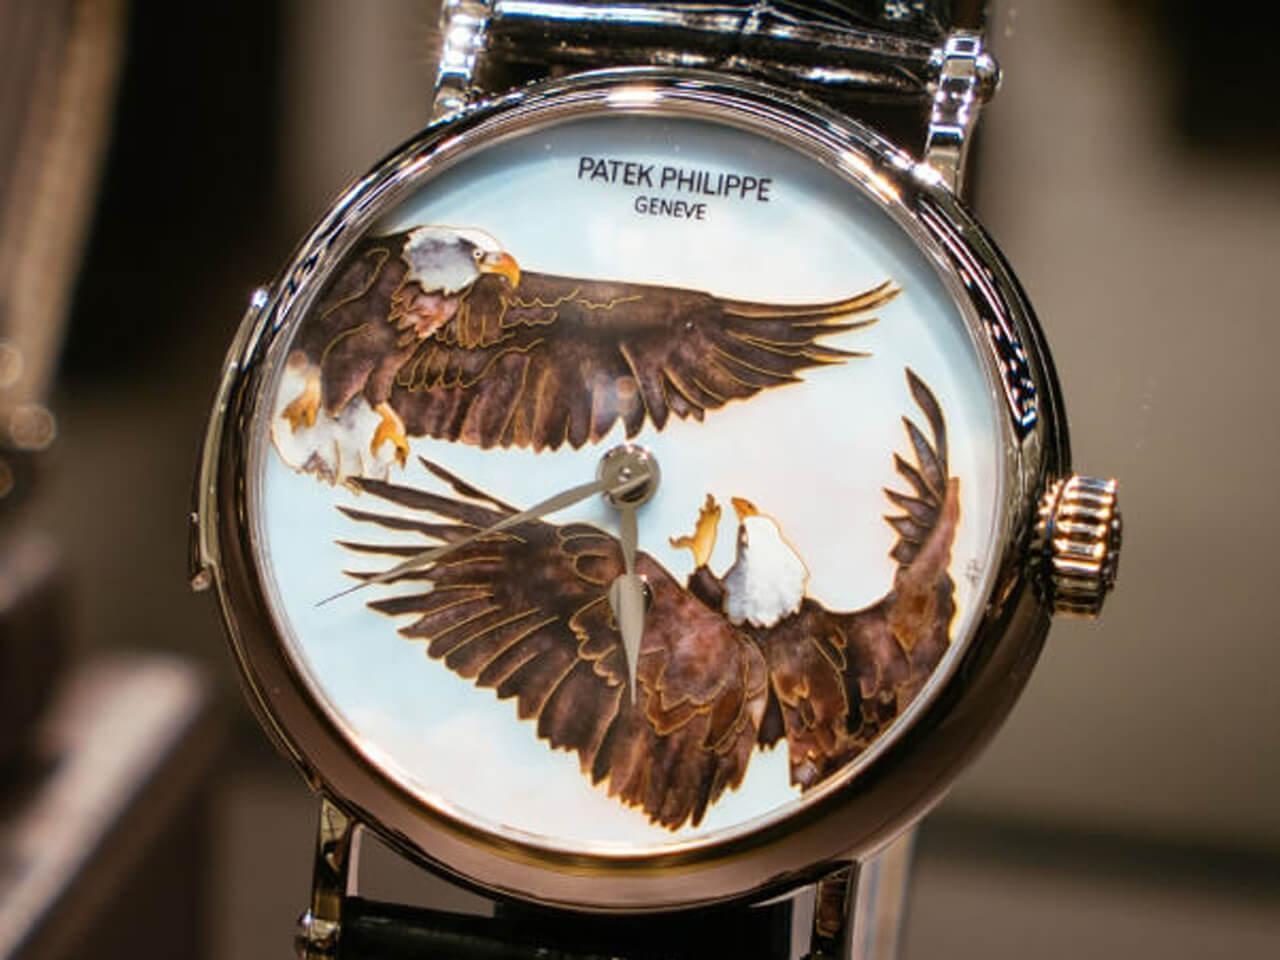 finest selection d6e7c 77642 パテック・フィリップ(PATEK PHILIPPE)5538G-011 トゥール ...